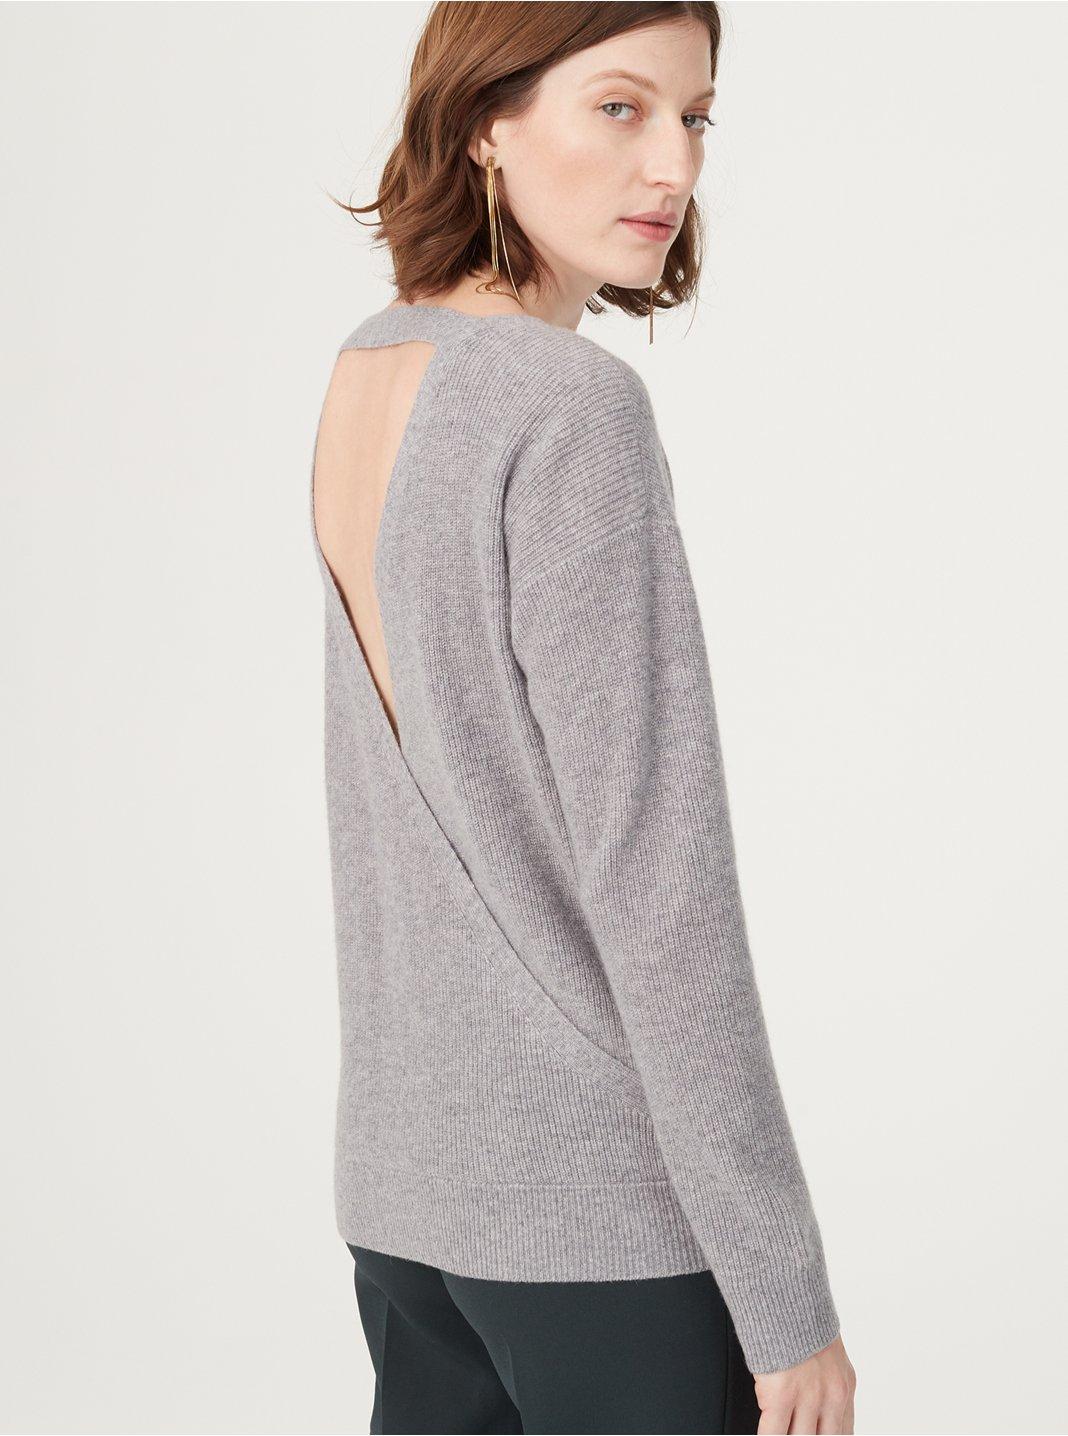 Slaudia Cashmere Sweater